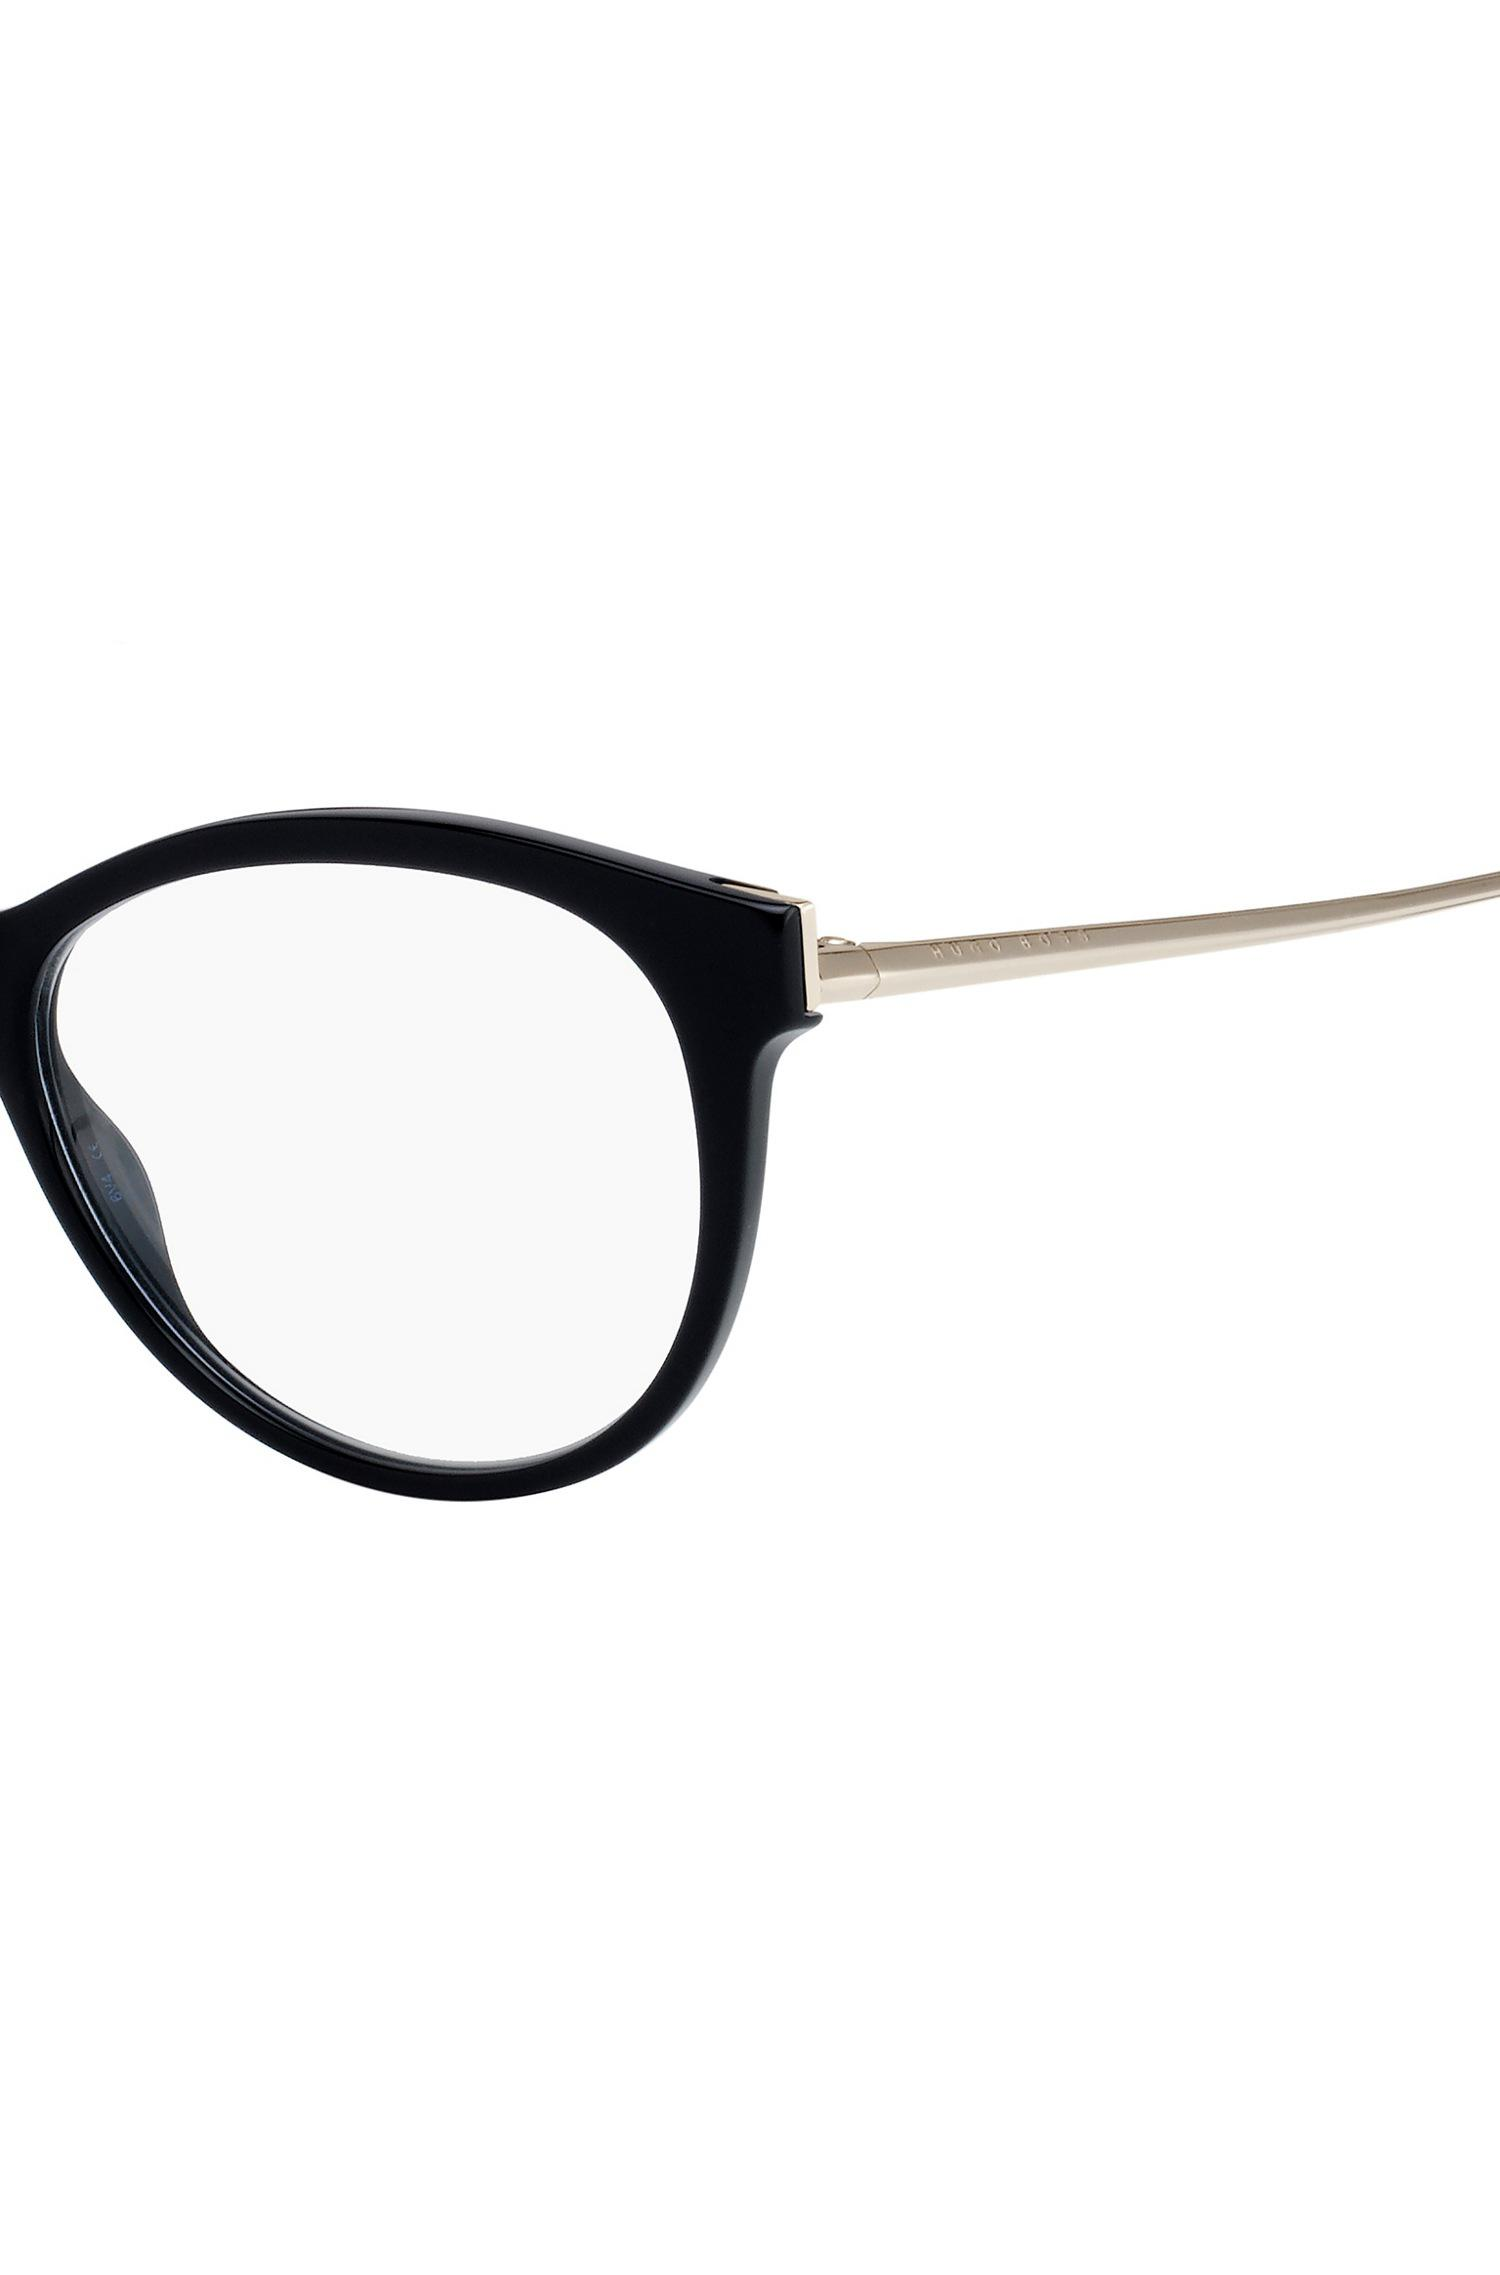 Lyst - Boss Black Acetate Cat-eye Optical Frames | 0894 Rhp in Black